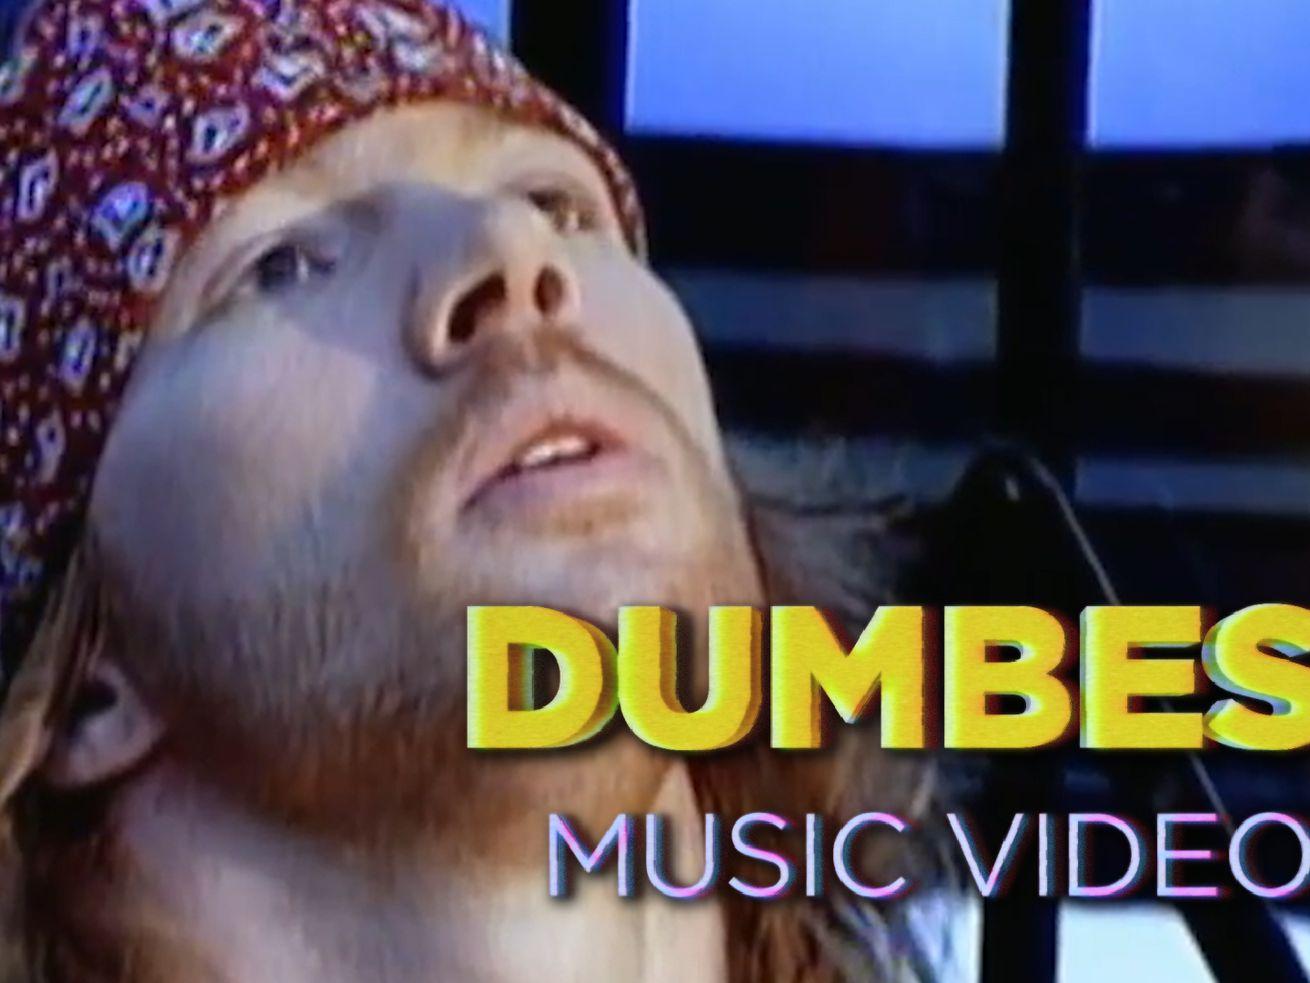 Dumbest Music Videos: Estranged by Guns n' Roses